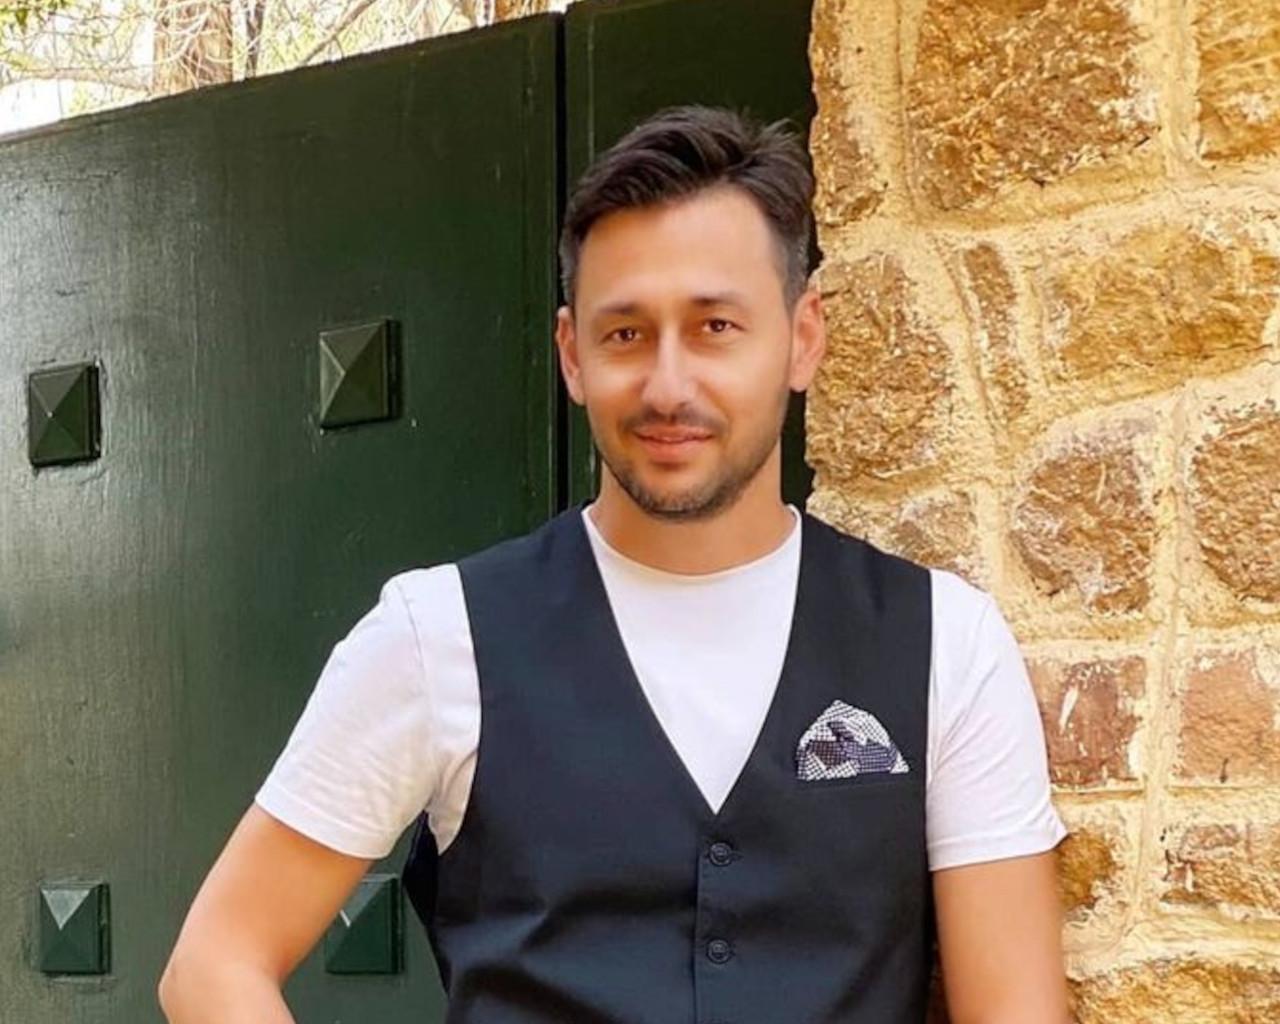 Survivor 4 - Πάνος Καλλίδης: «Θα γίνονταν τα πράγματα ακόμη δυσκολότερα και δεν ήθελα να φτάσω στο σημείο να μην μπορώ να ελέγξω τον εαυτό μου»